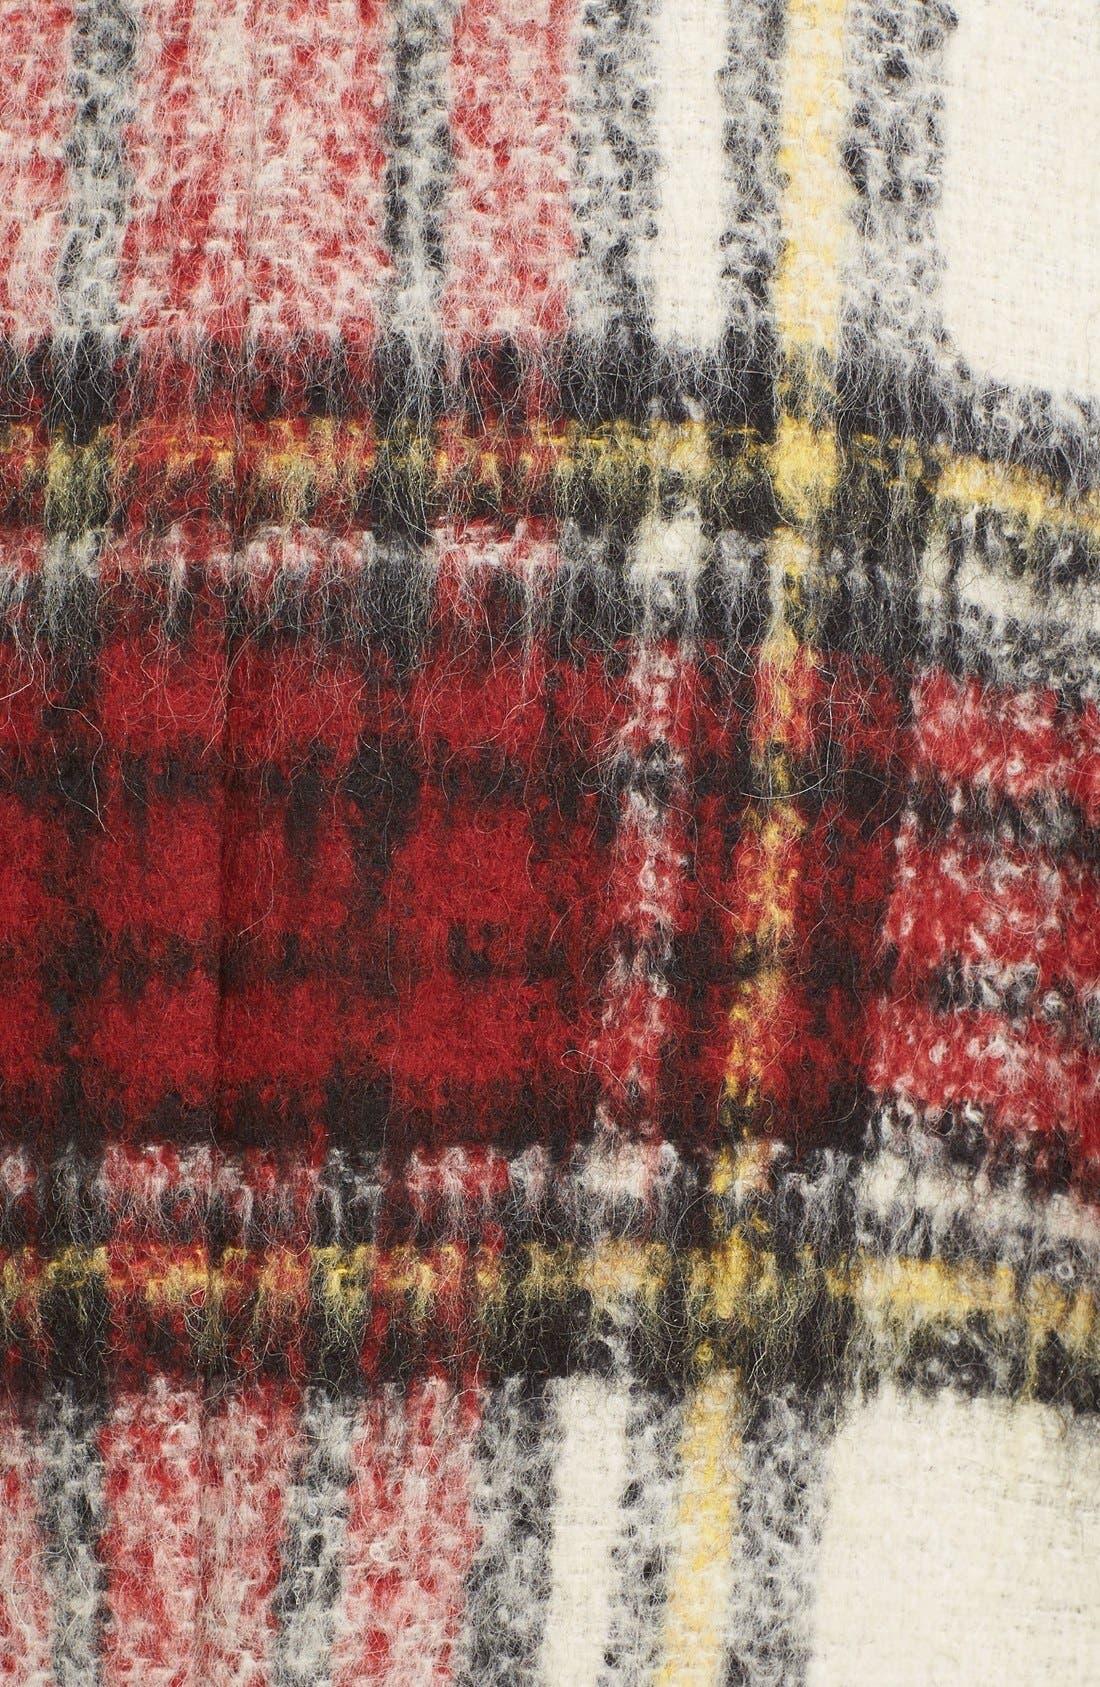 BURBERRY PRORSUM,                             Tartan Plaid Wool Blend Coat,                             Alternate thumbnail 5, color,                             930